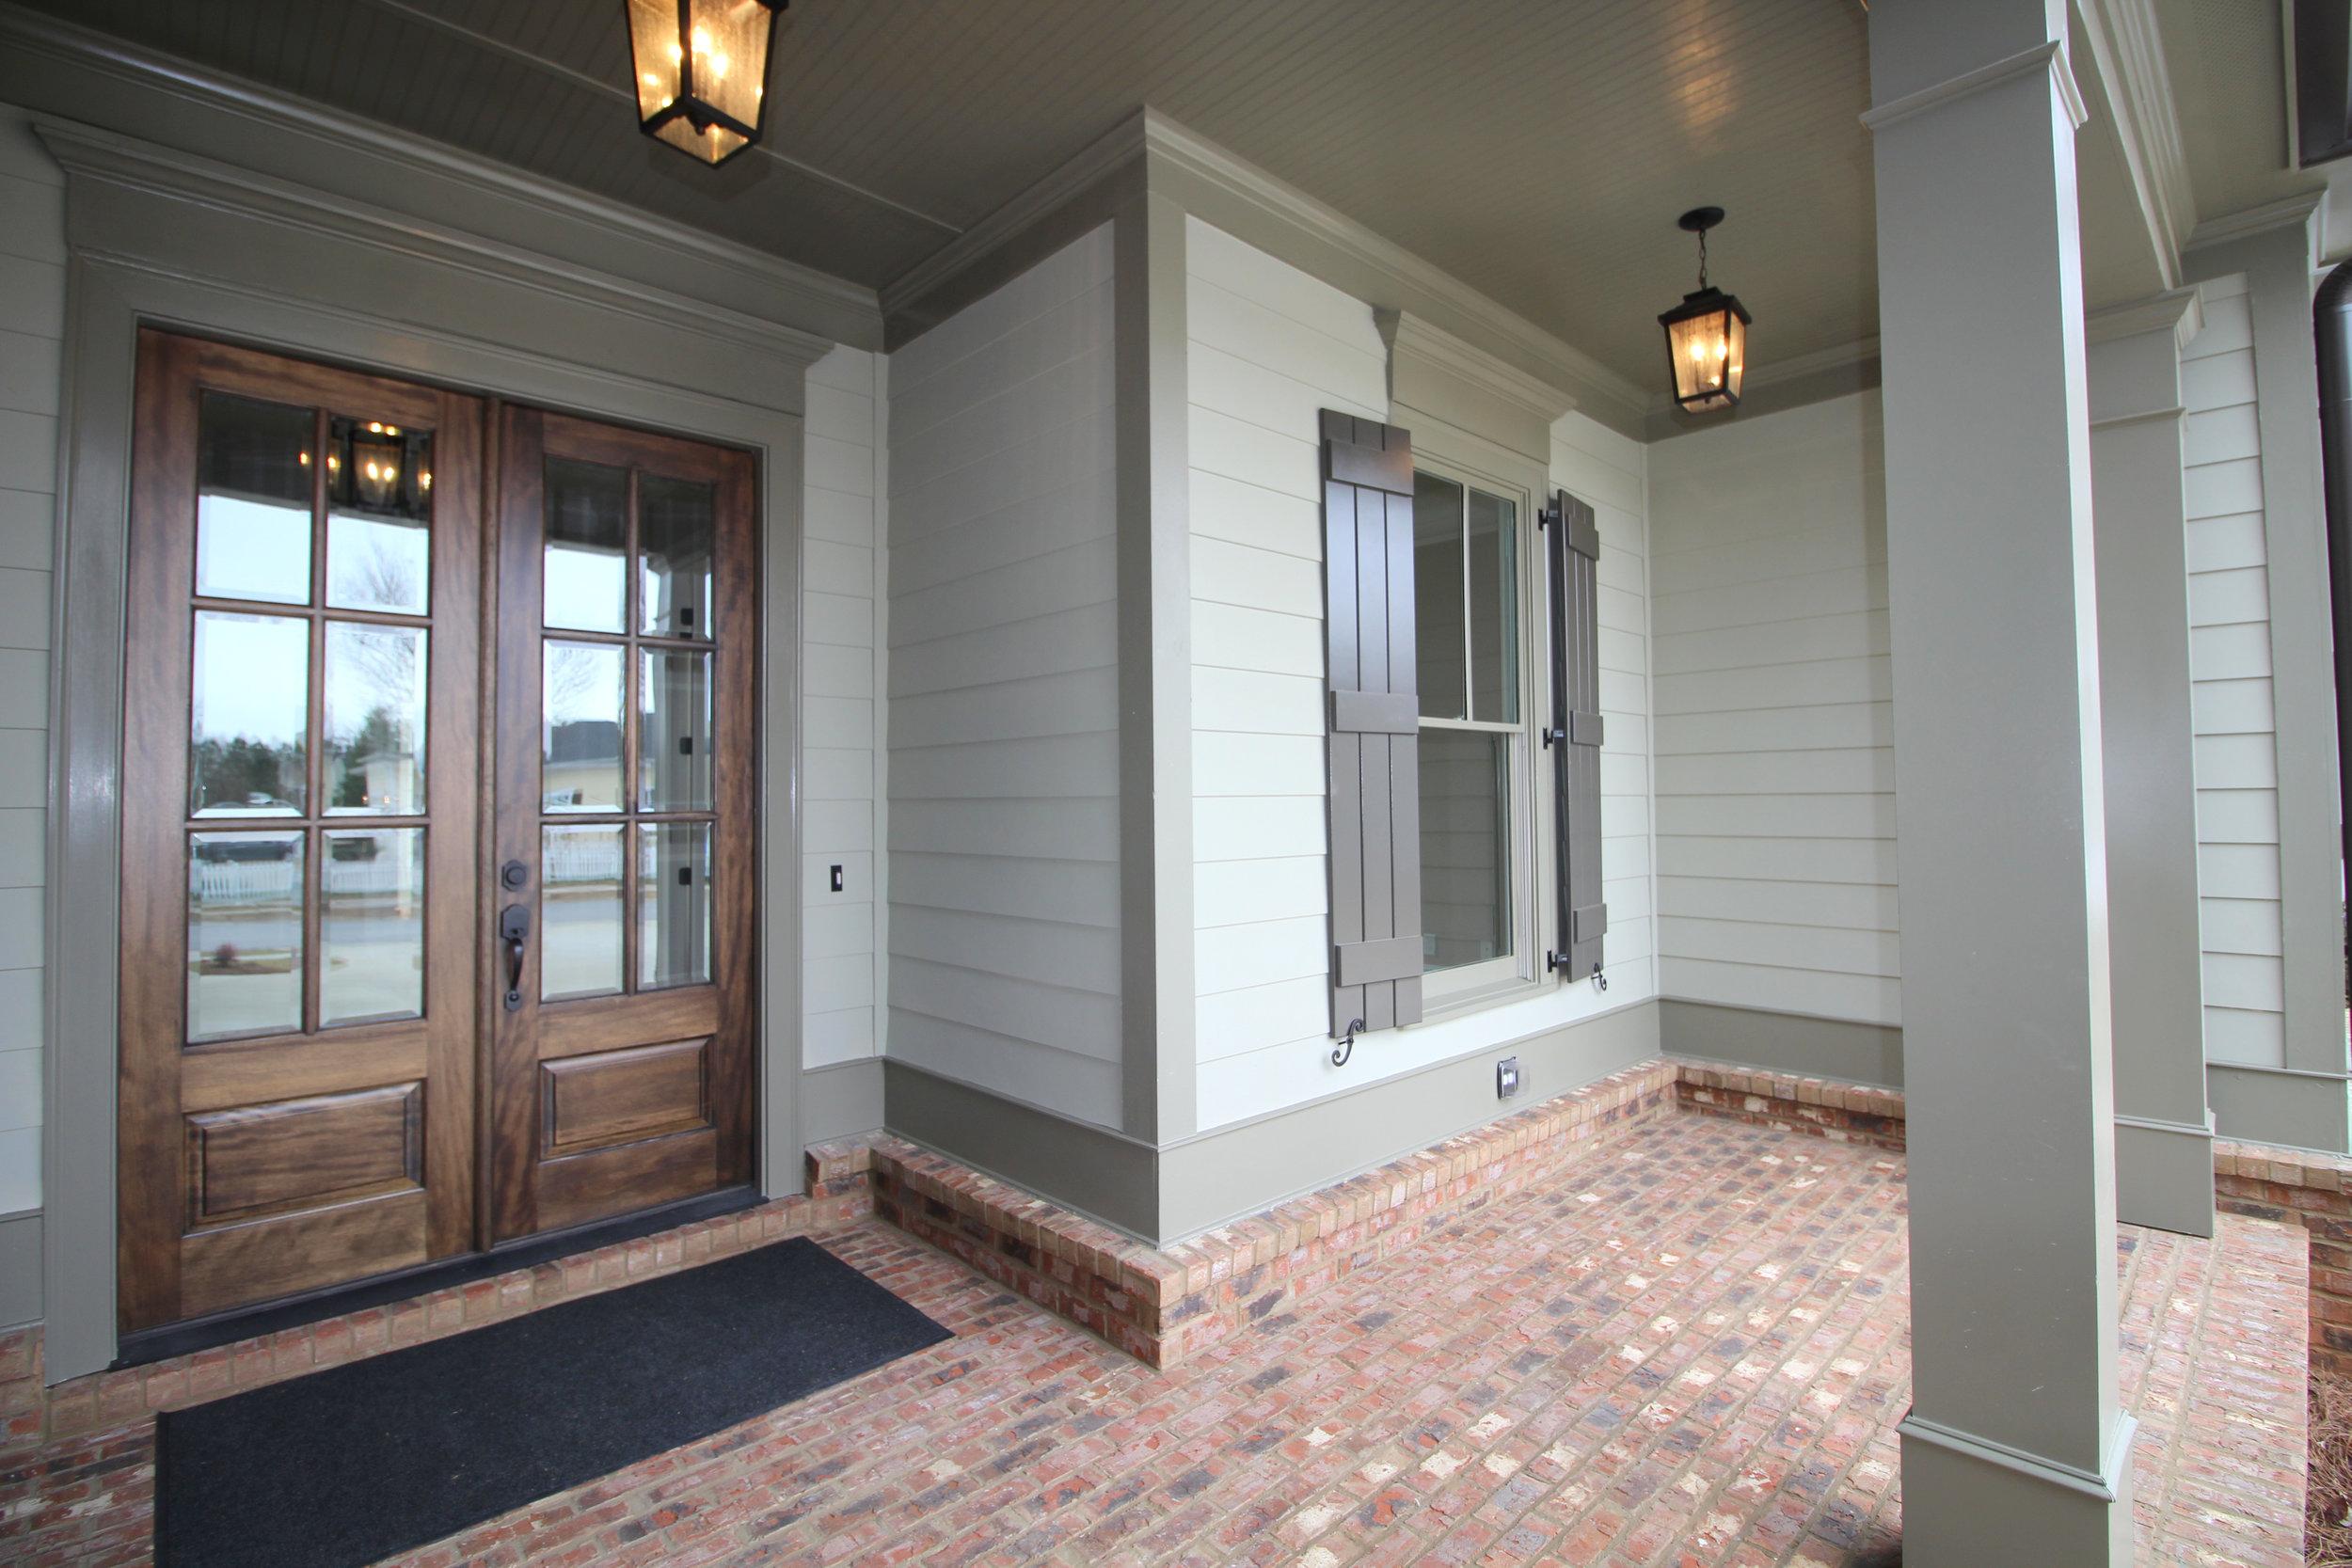 double-mahogany-front-doors-1756-greenleffe-drive-statham-ga-30666-the-georgia-club-oconee-county-oconee-springs-athens-area-home-for-sale-courtyard-homes-.JPG